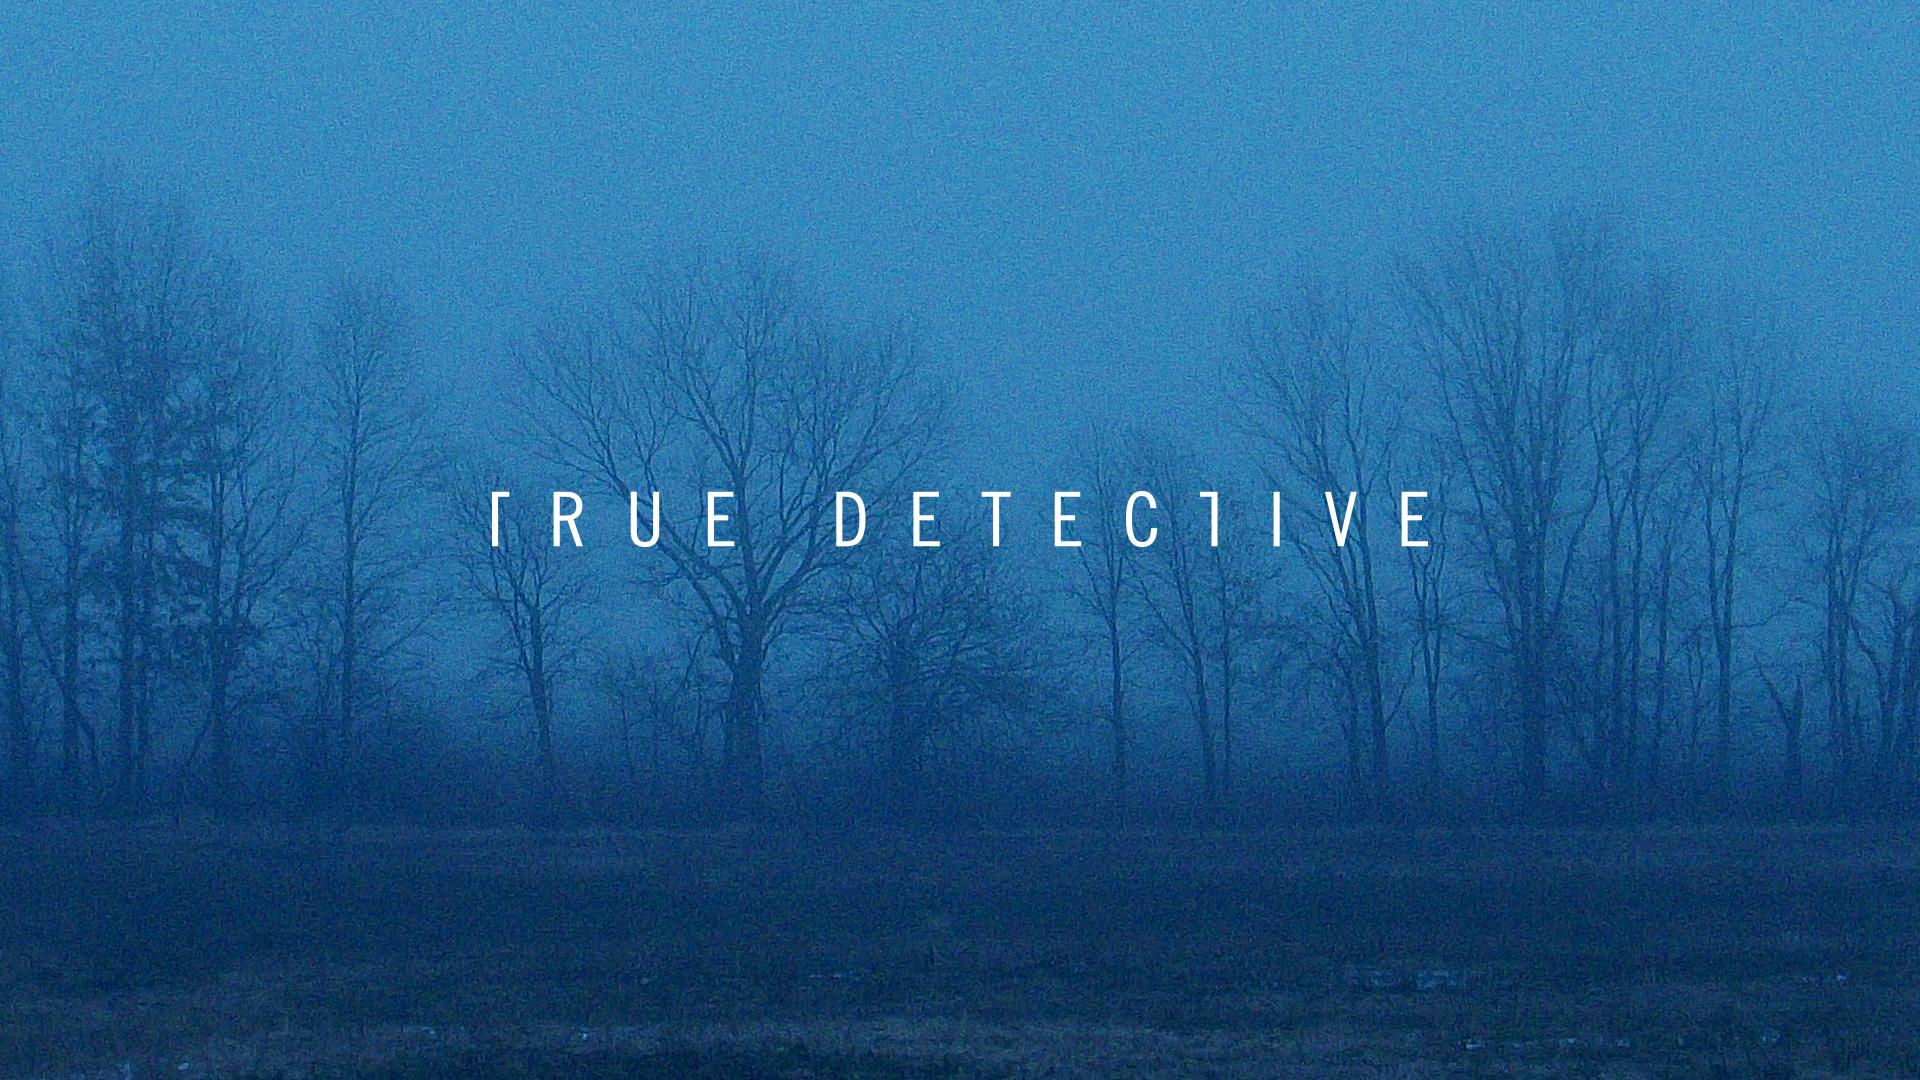 True Detective wallpaper 5